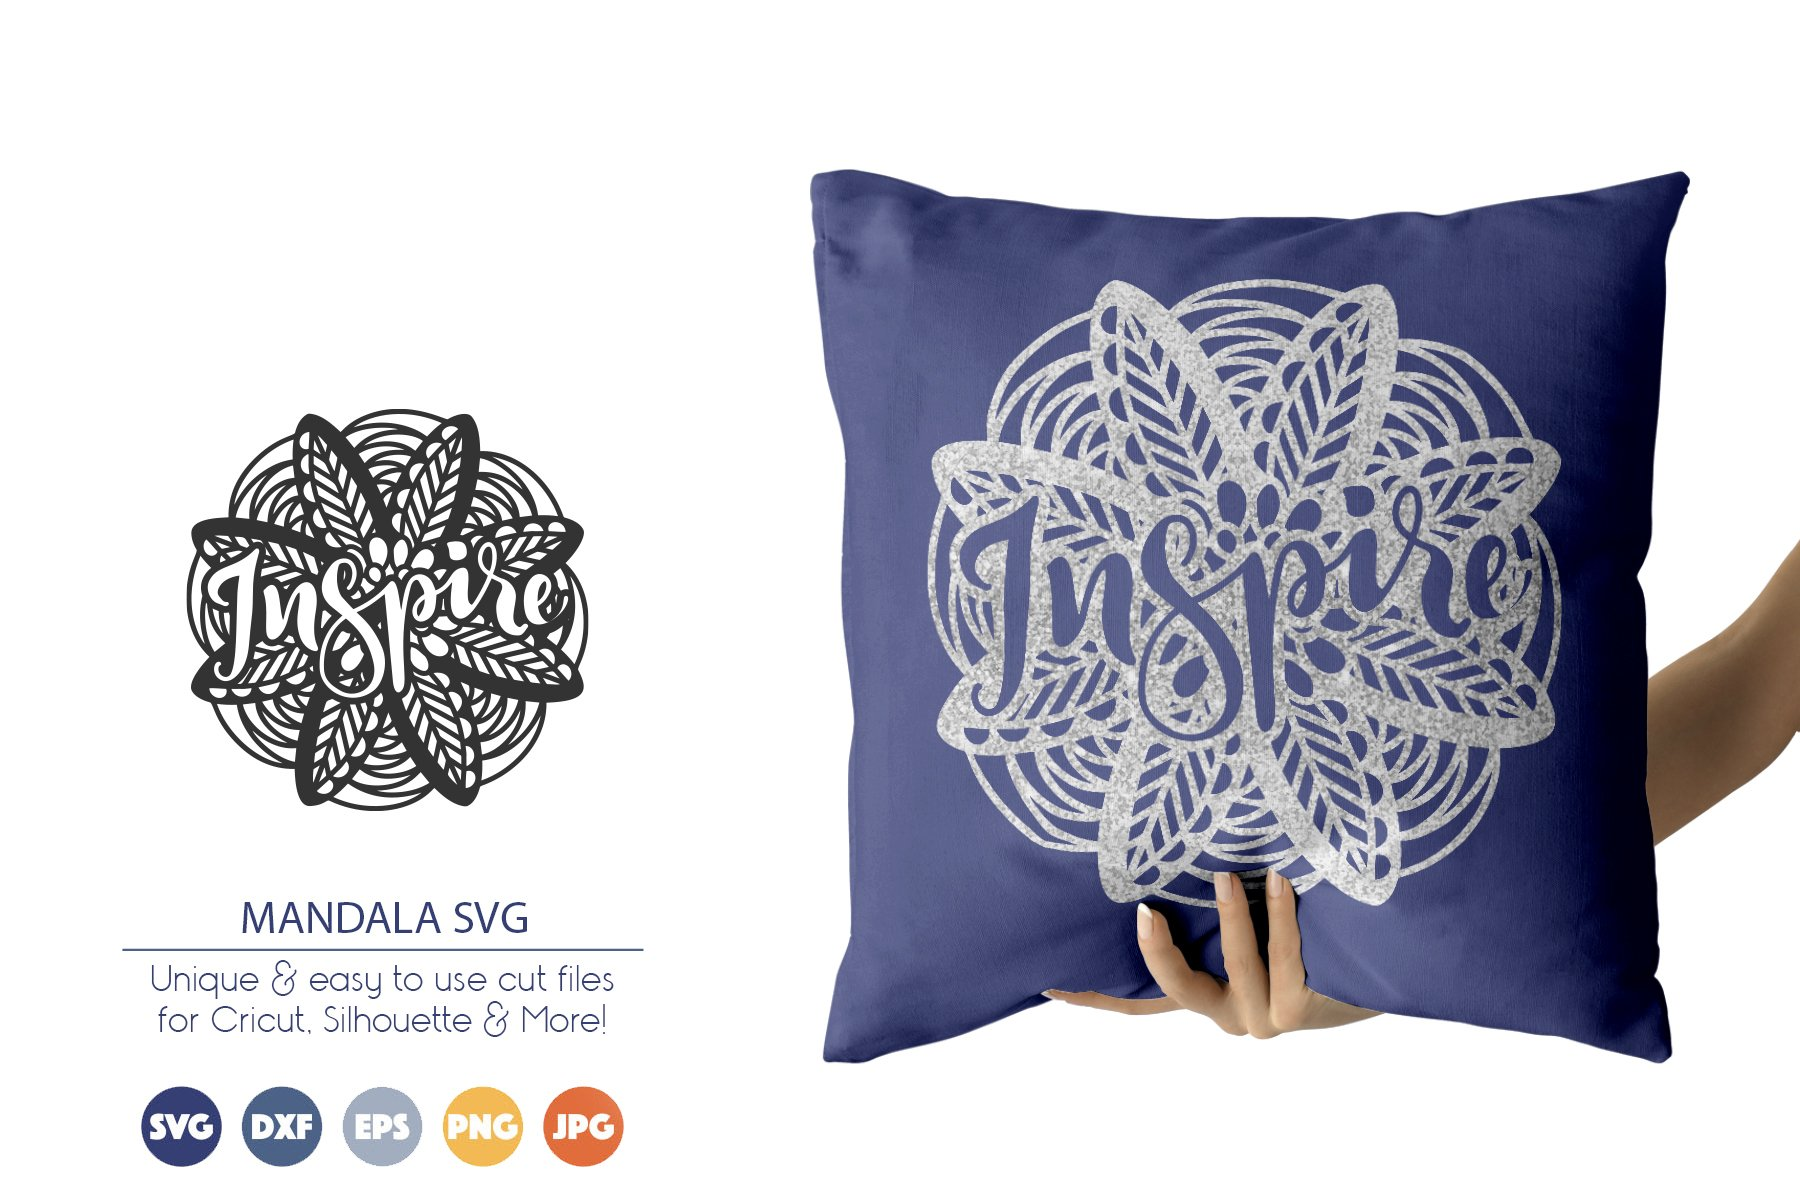 Inspire SVG | Mandala SVG Cut Files example image 1